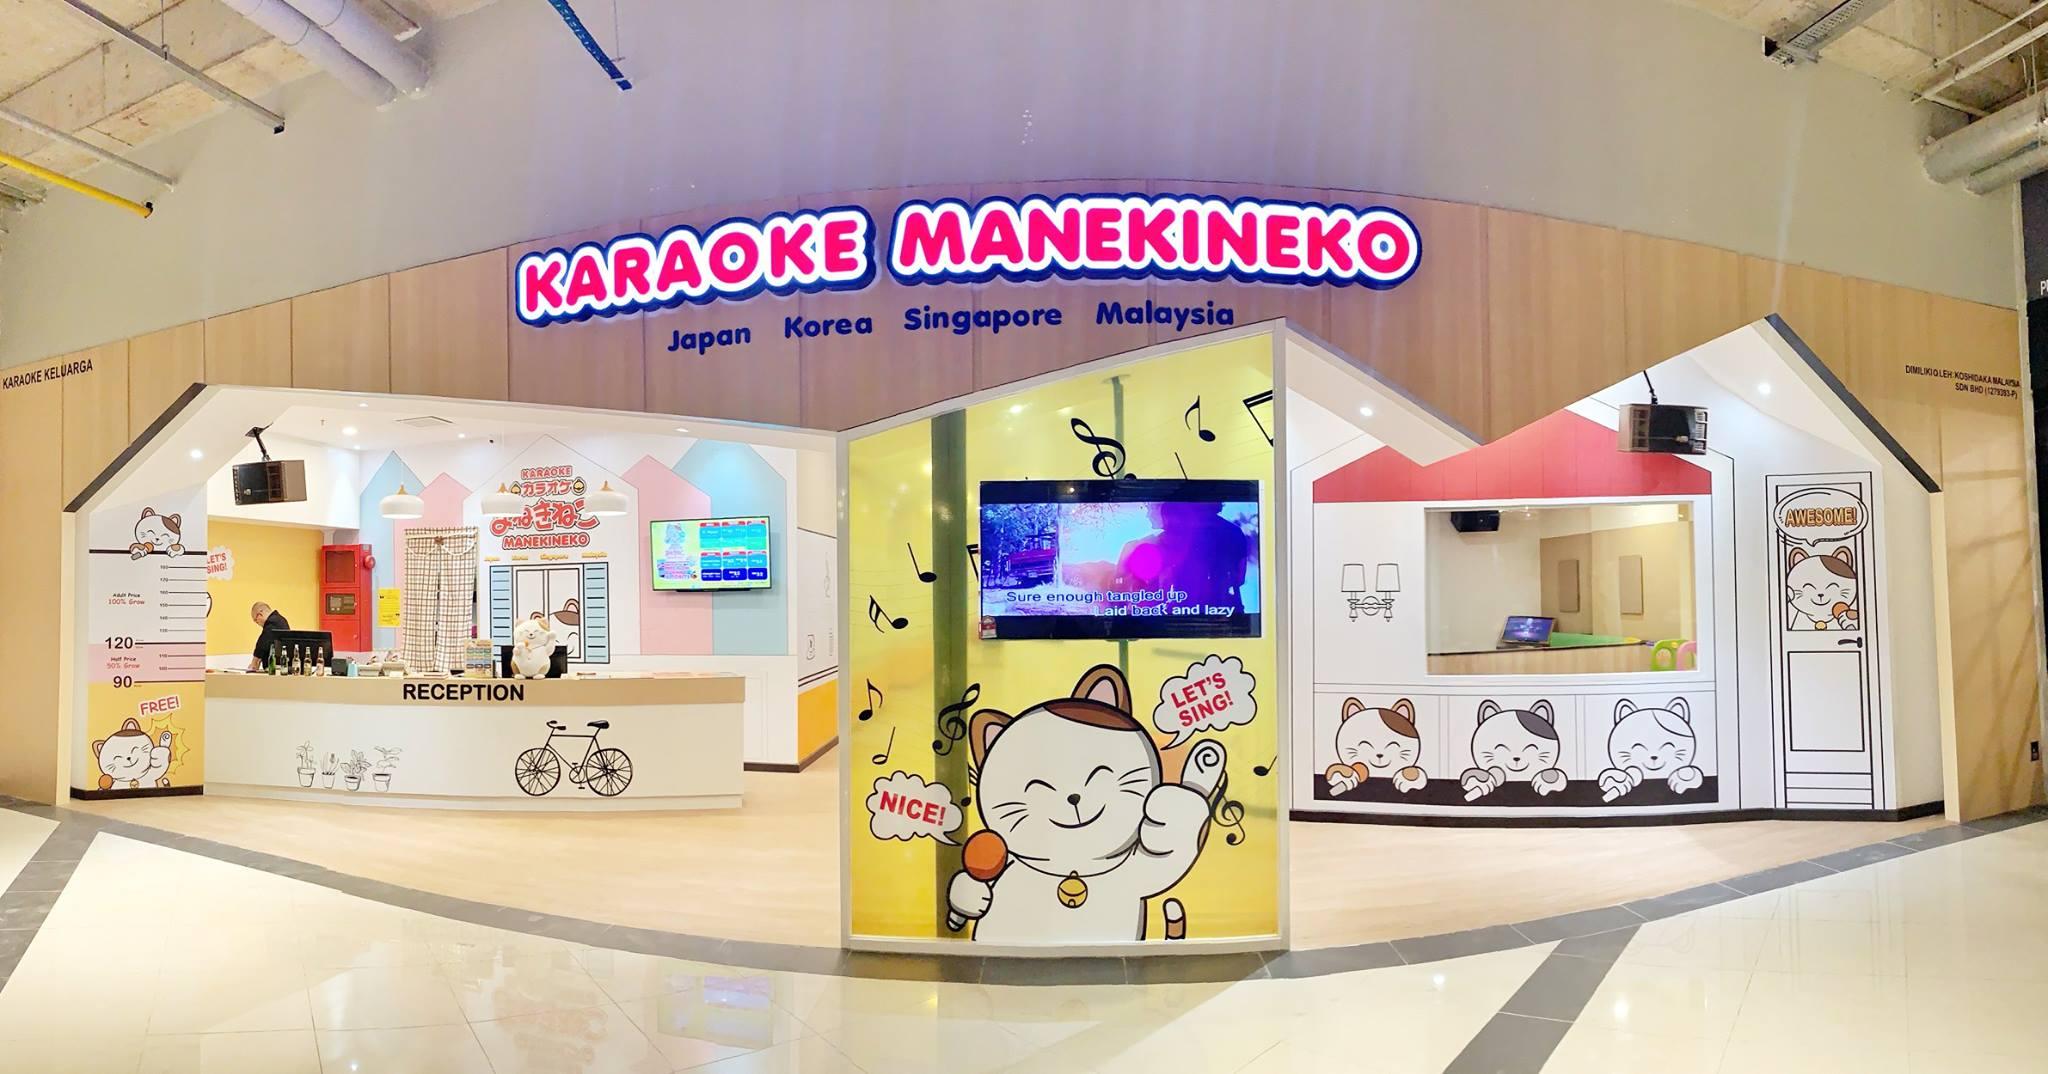 Best Karaoke in KL, manekineko